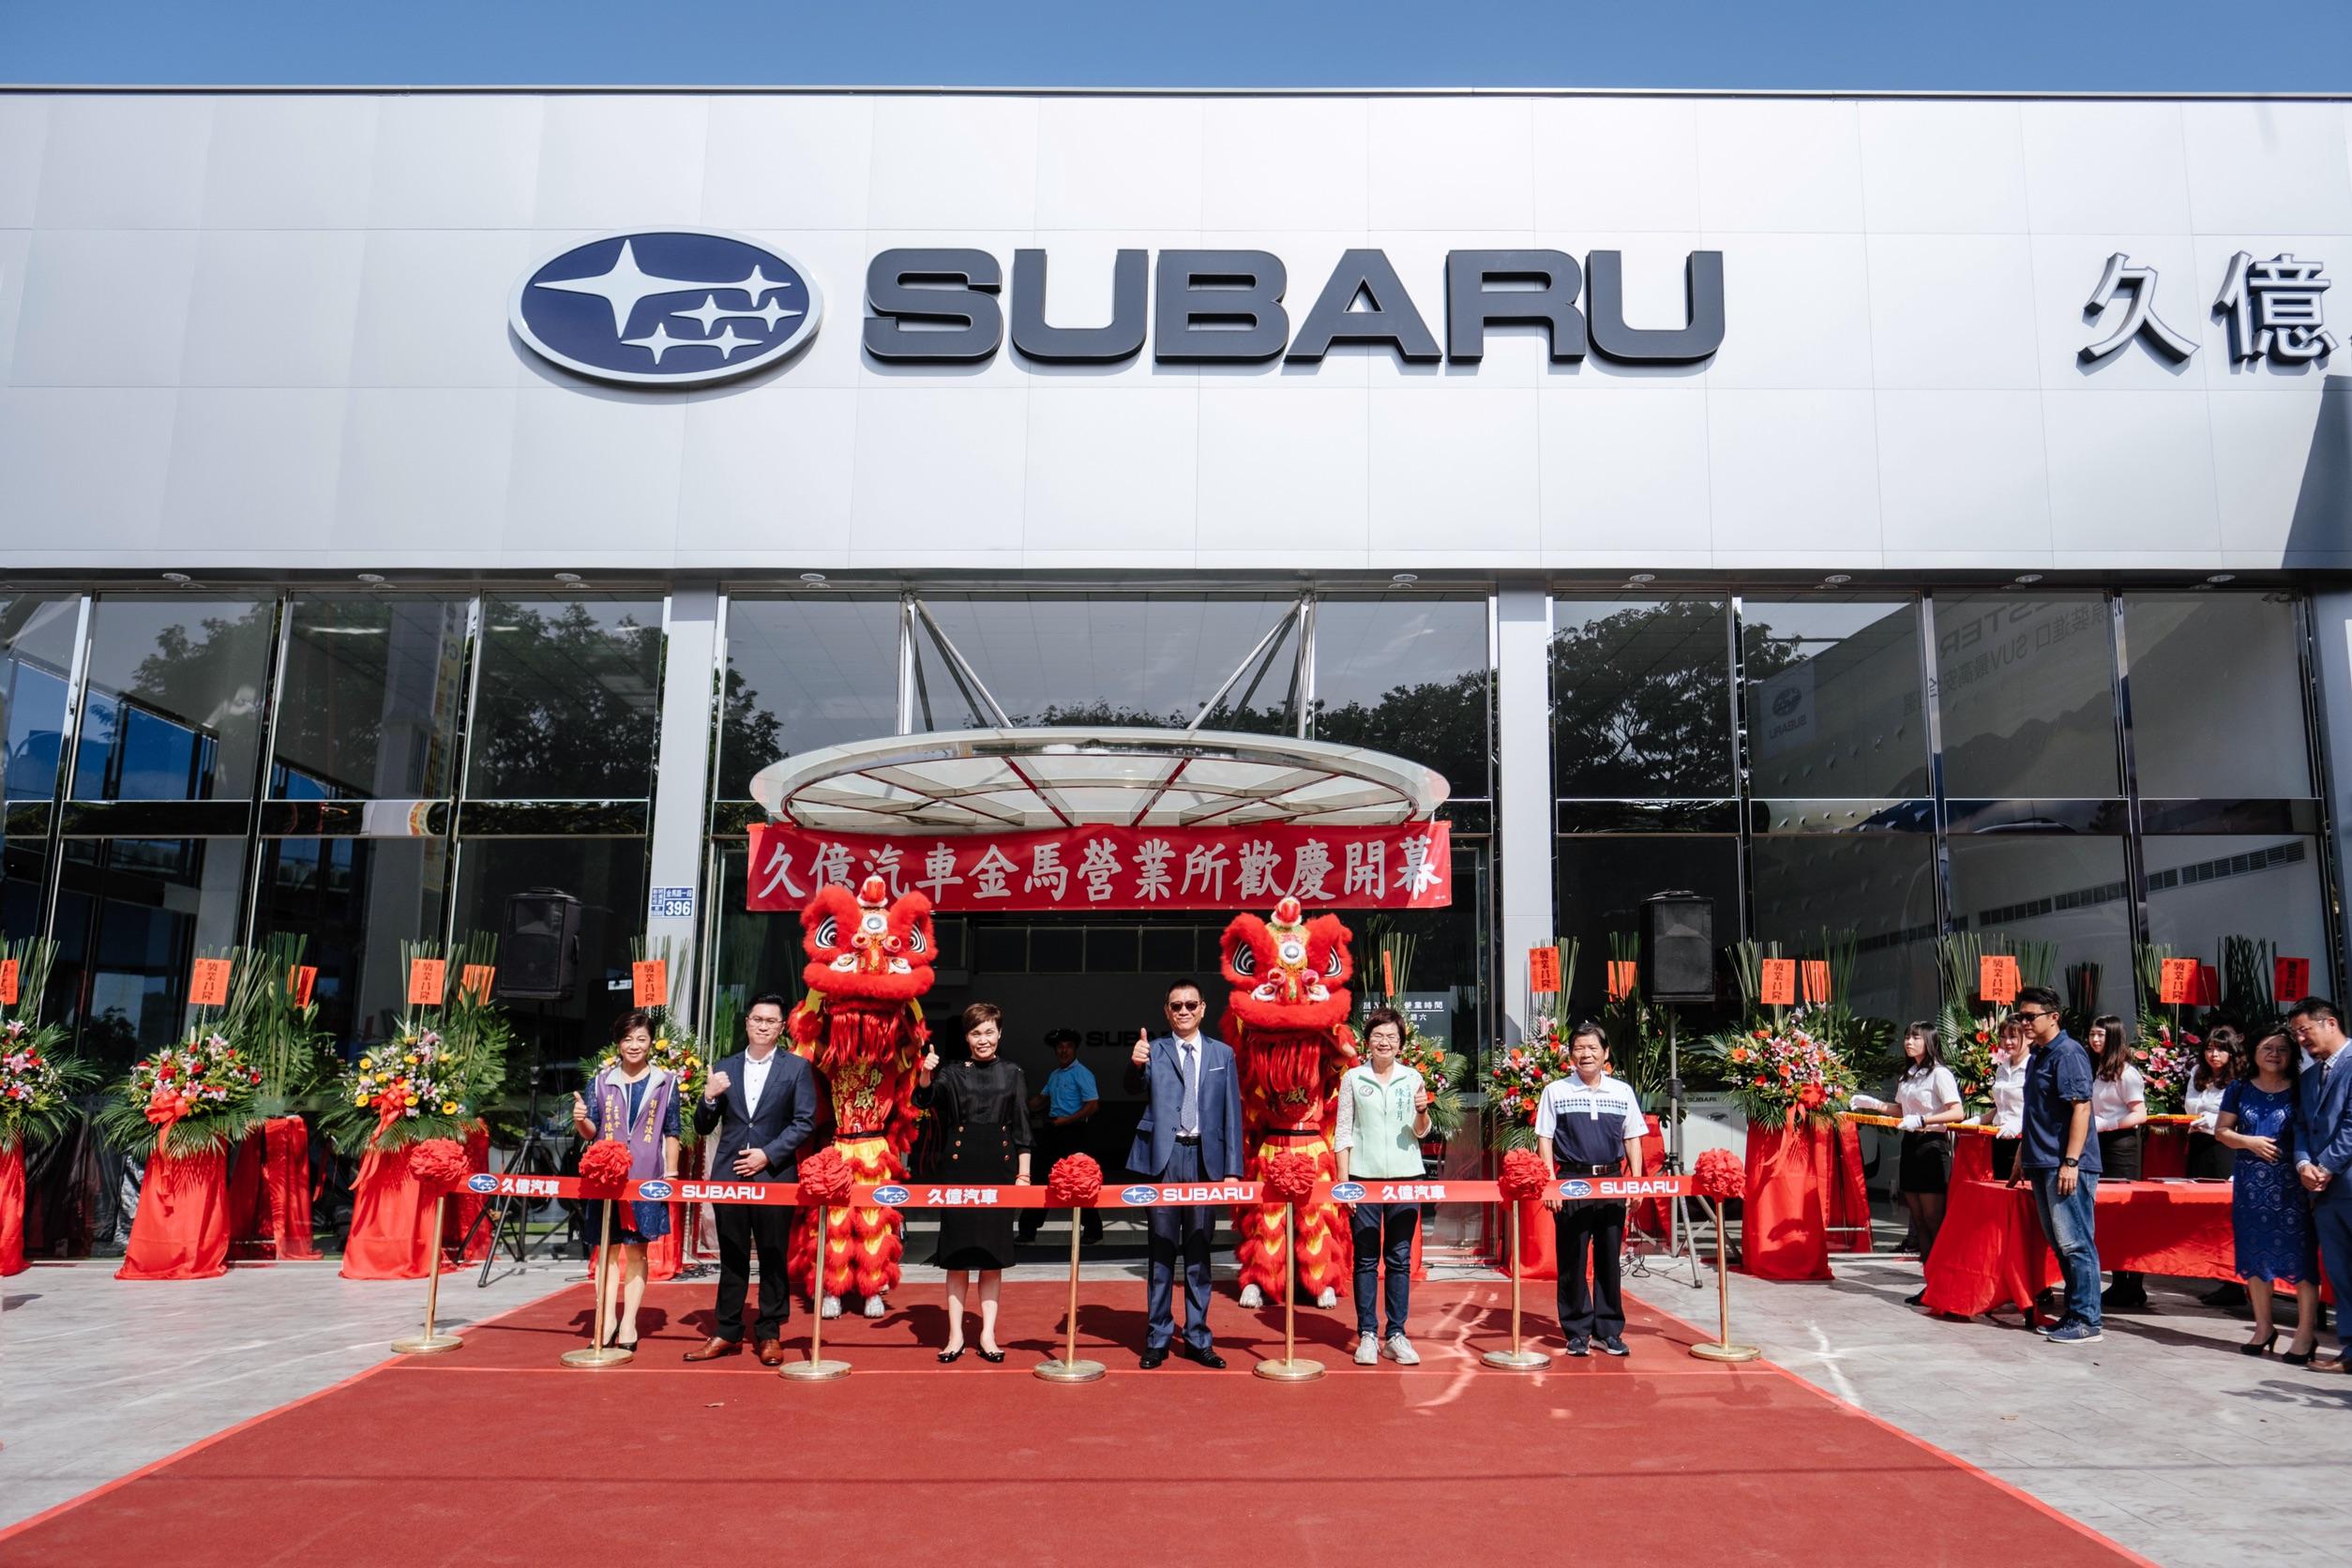 Subaru 台灣意美汽車董事總經理方淑霞女士(左三)親自出席開幕剪裁儀式。